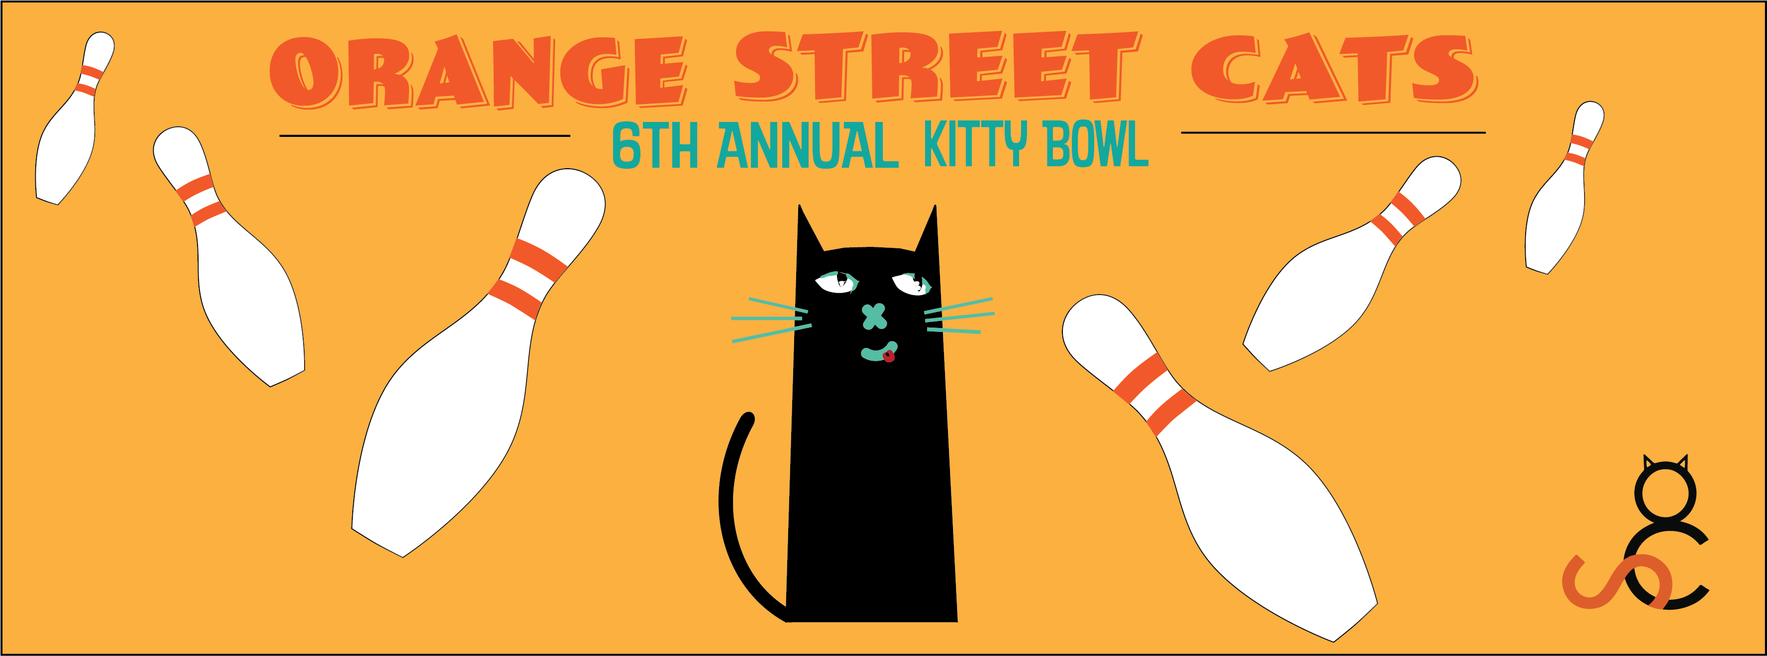 Kitty Bowl 2018 image